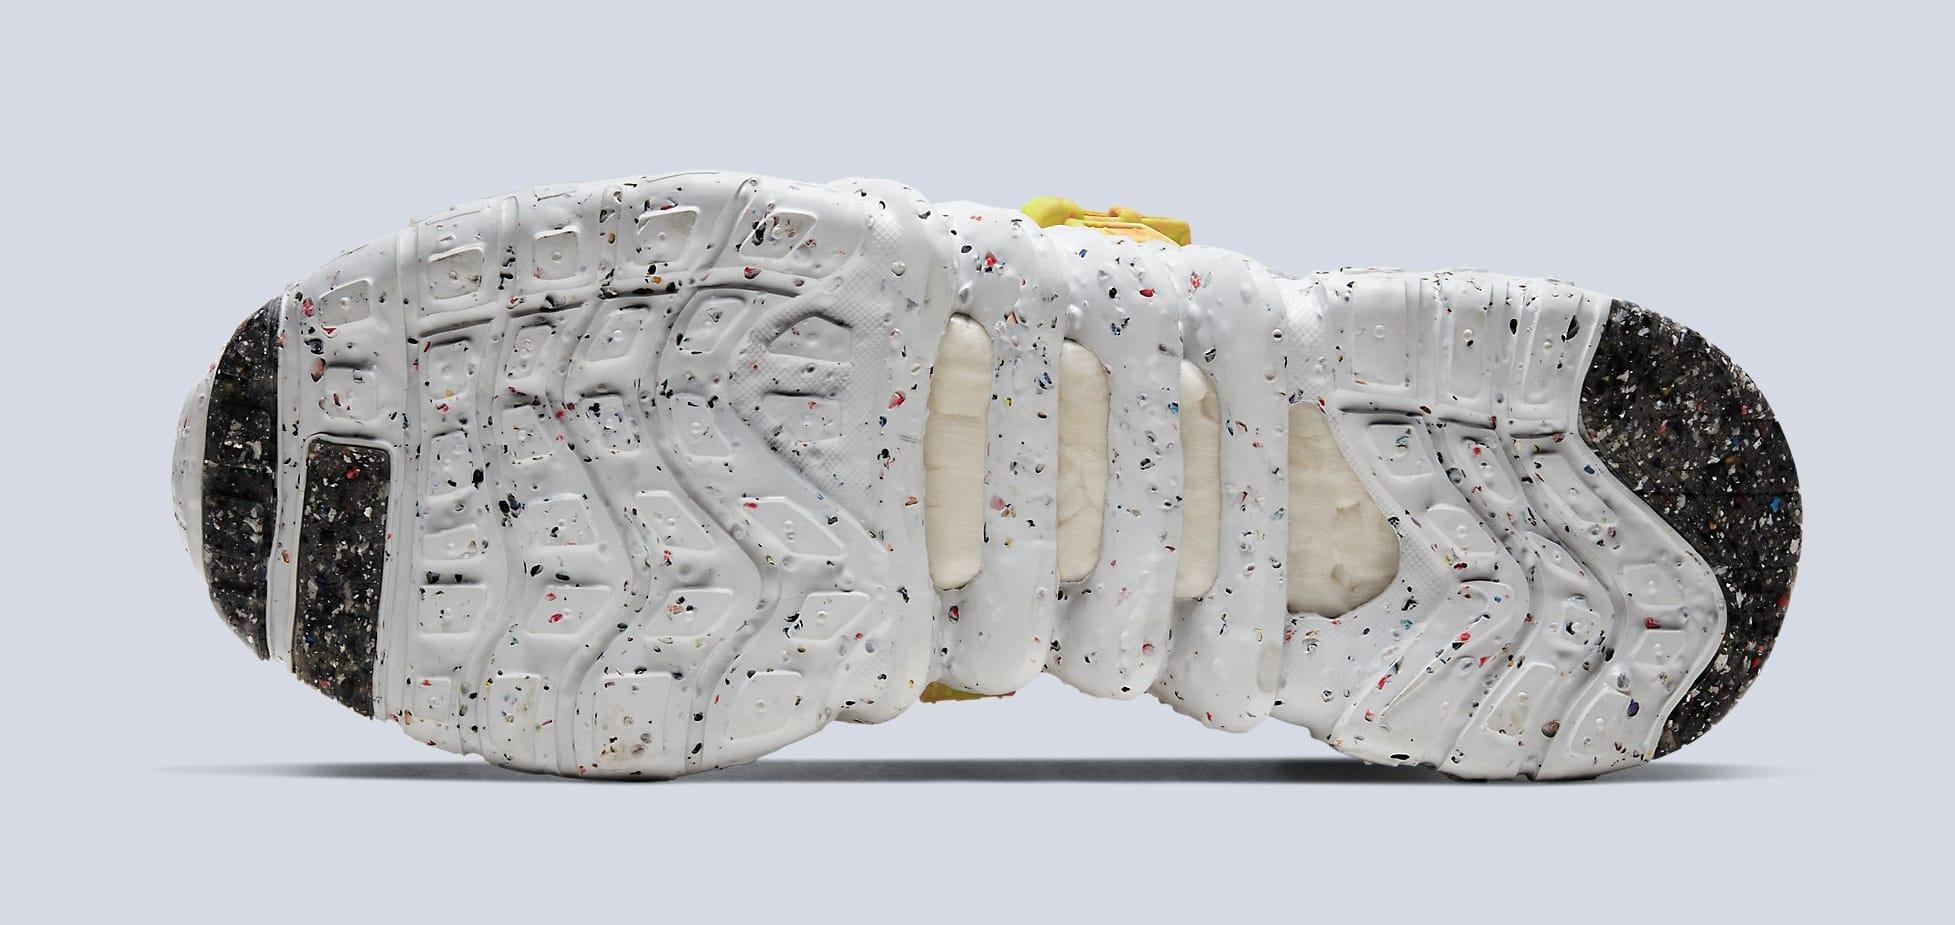 Nike Space Hippie 03 'Grey/Volt' CQ3989-002 Outsole